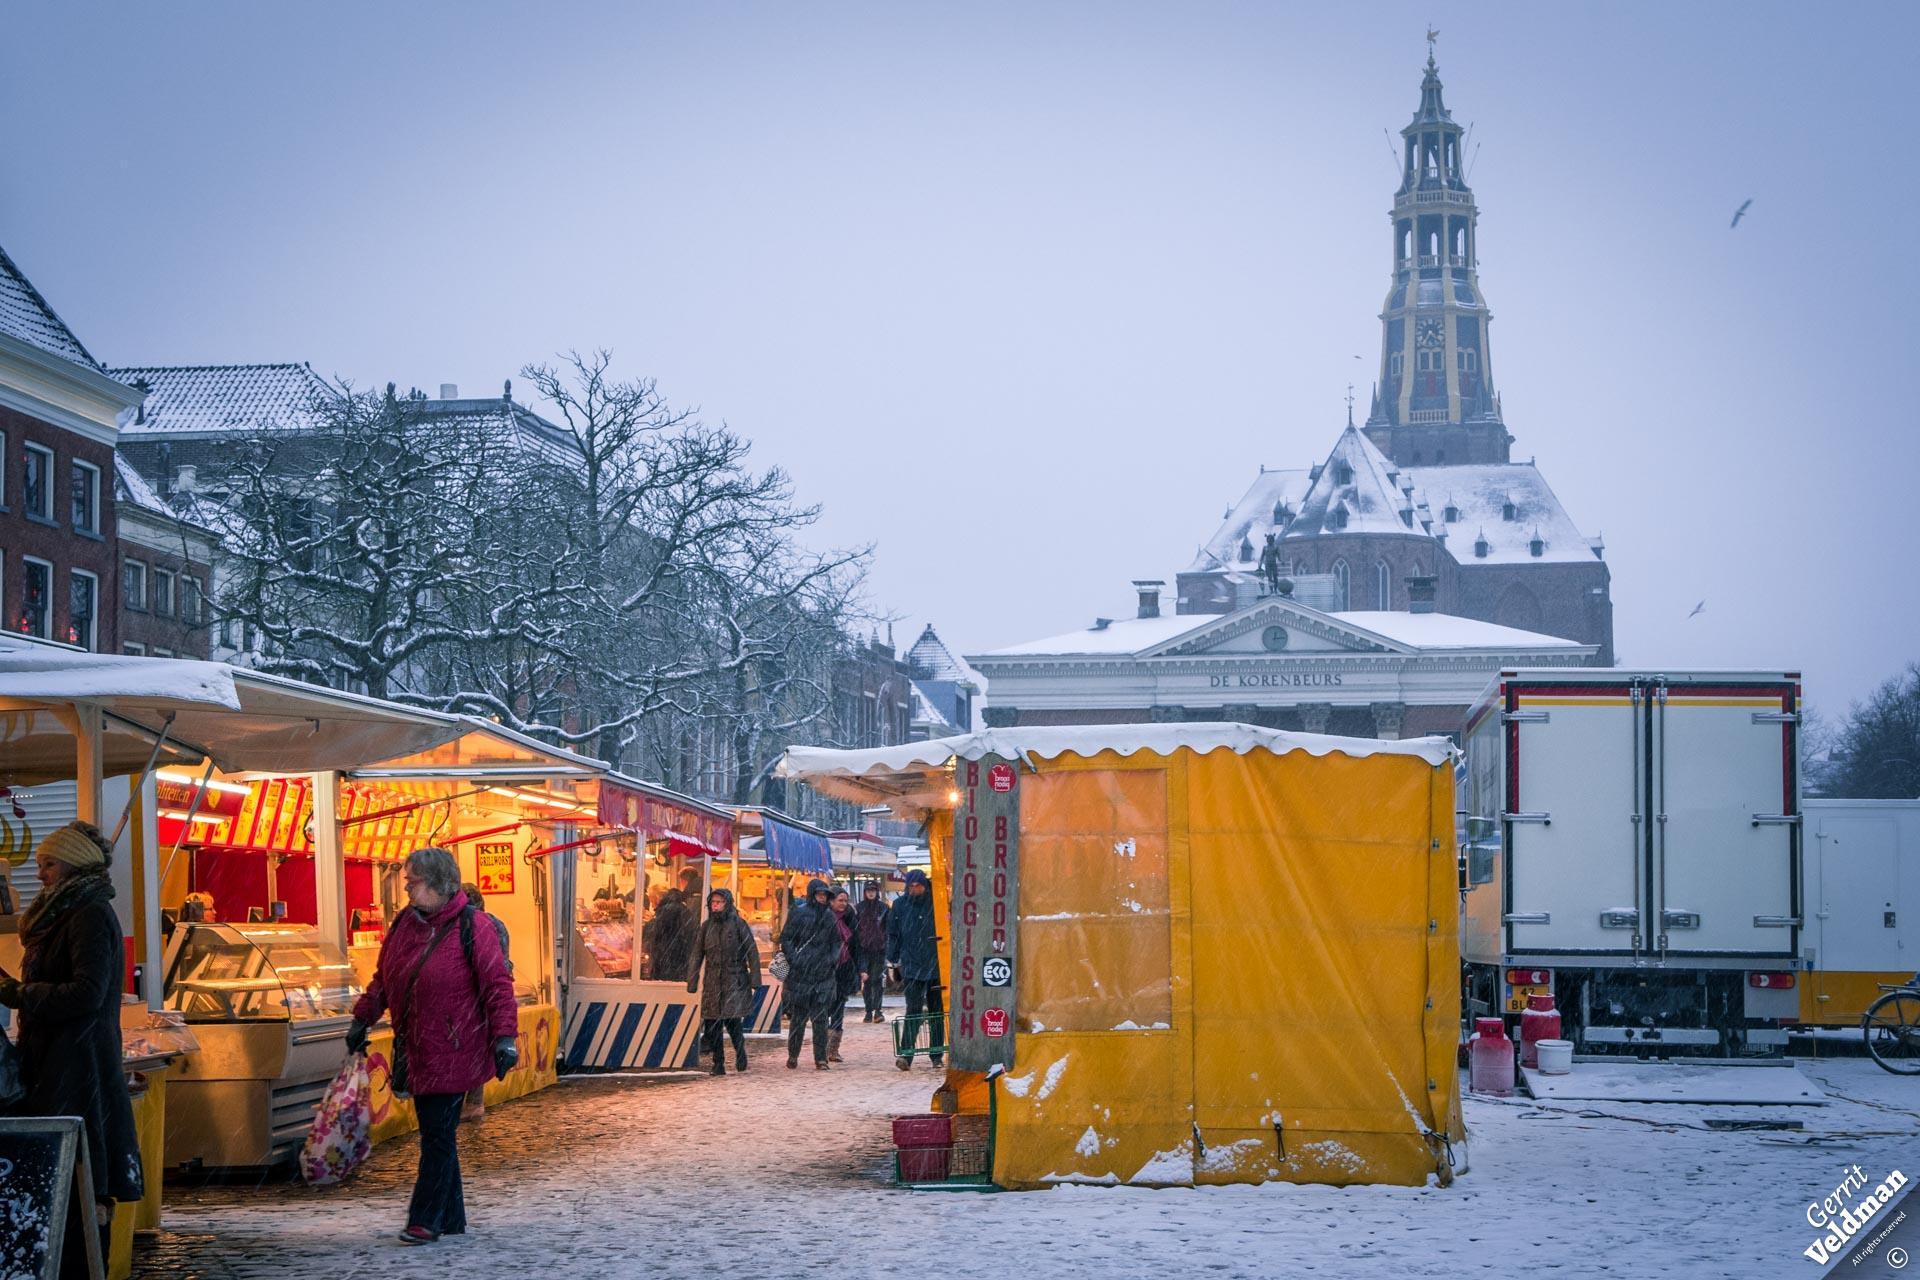 Markt in Groningen